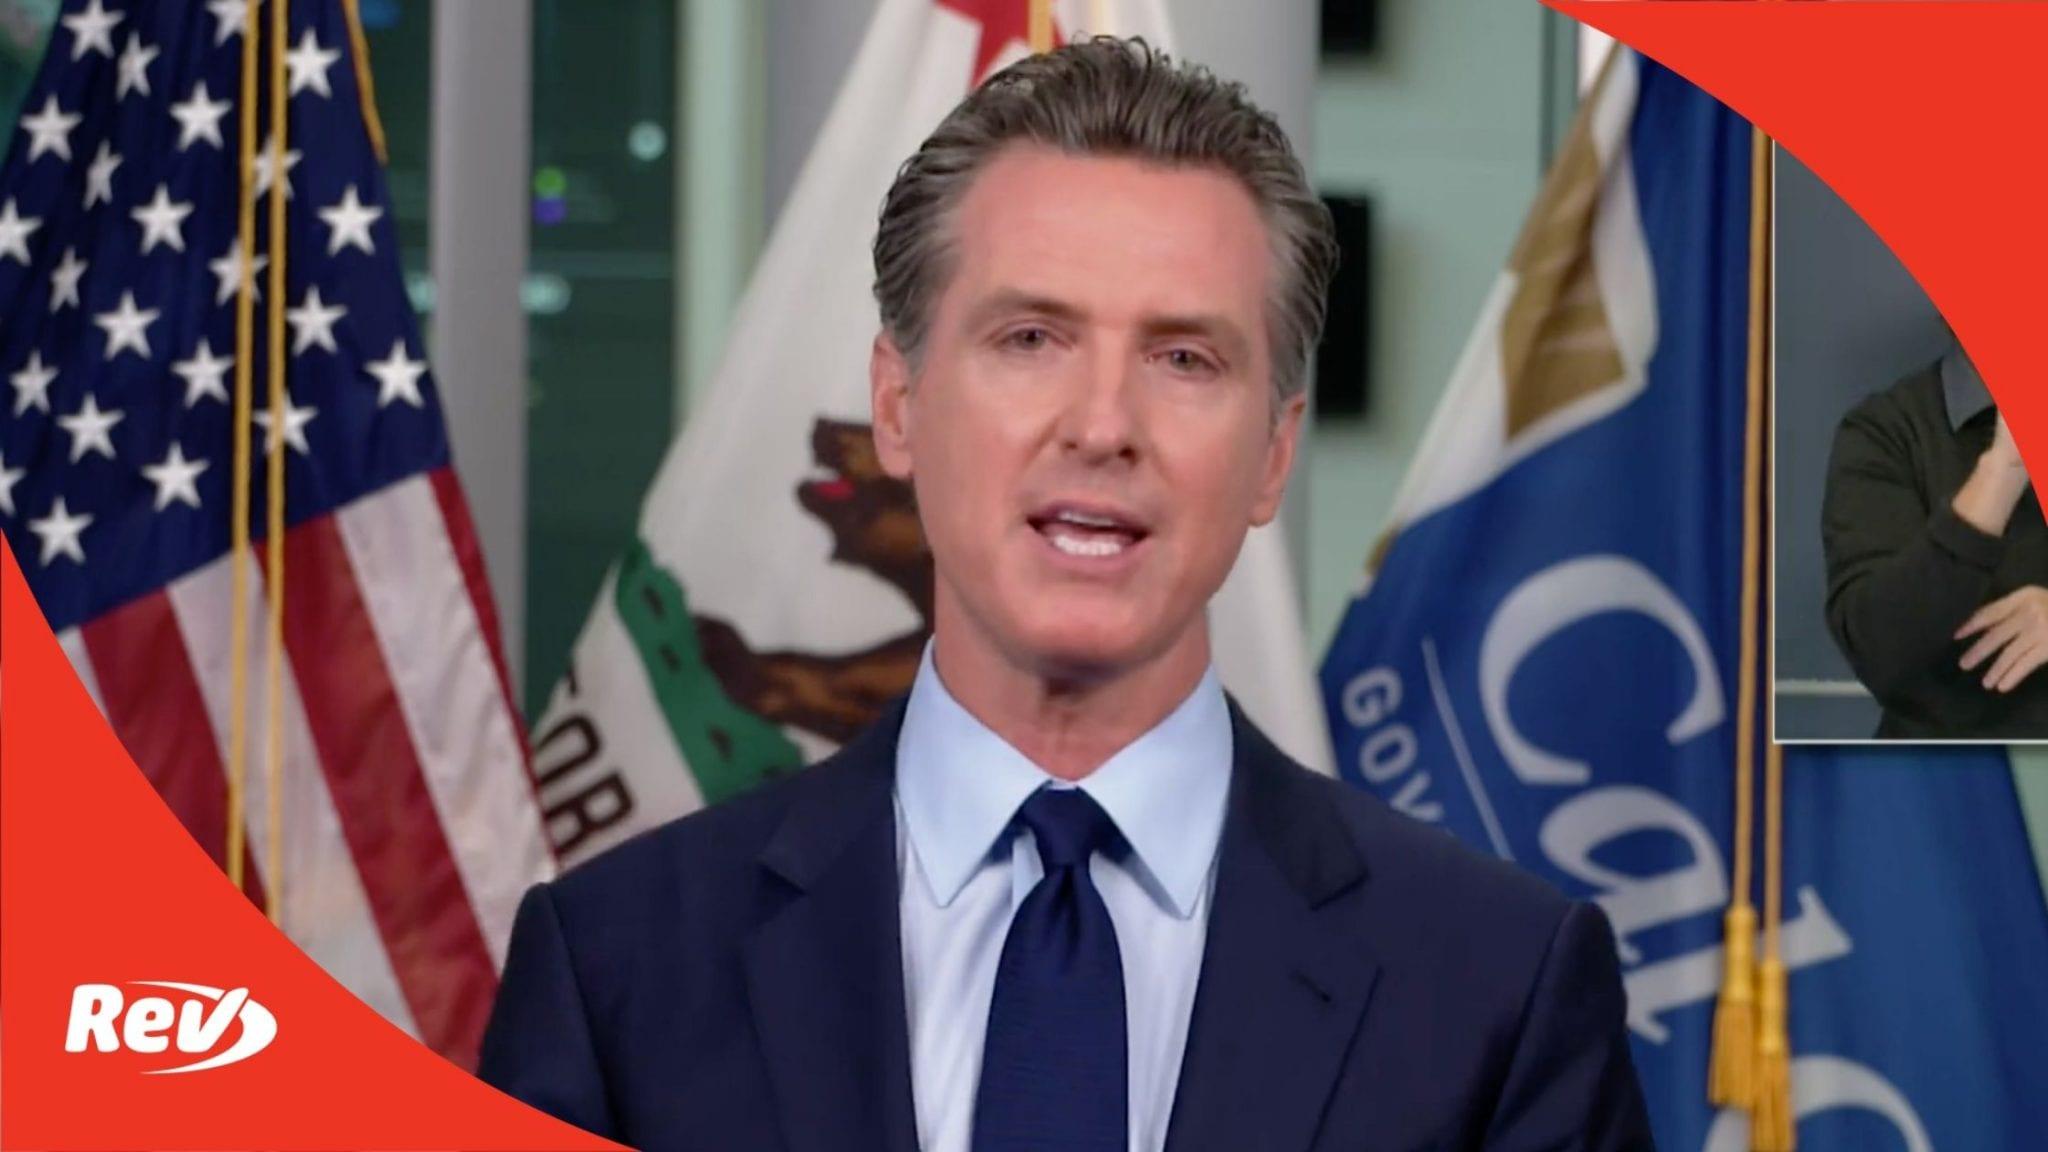 California Governor Gavin Newsom September 21 Press Conference Transcript